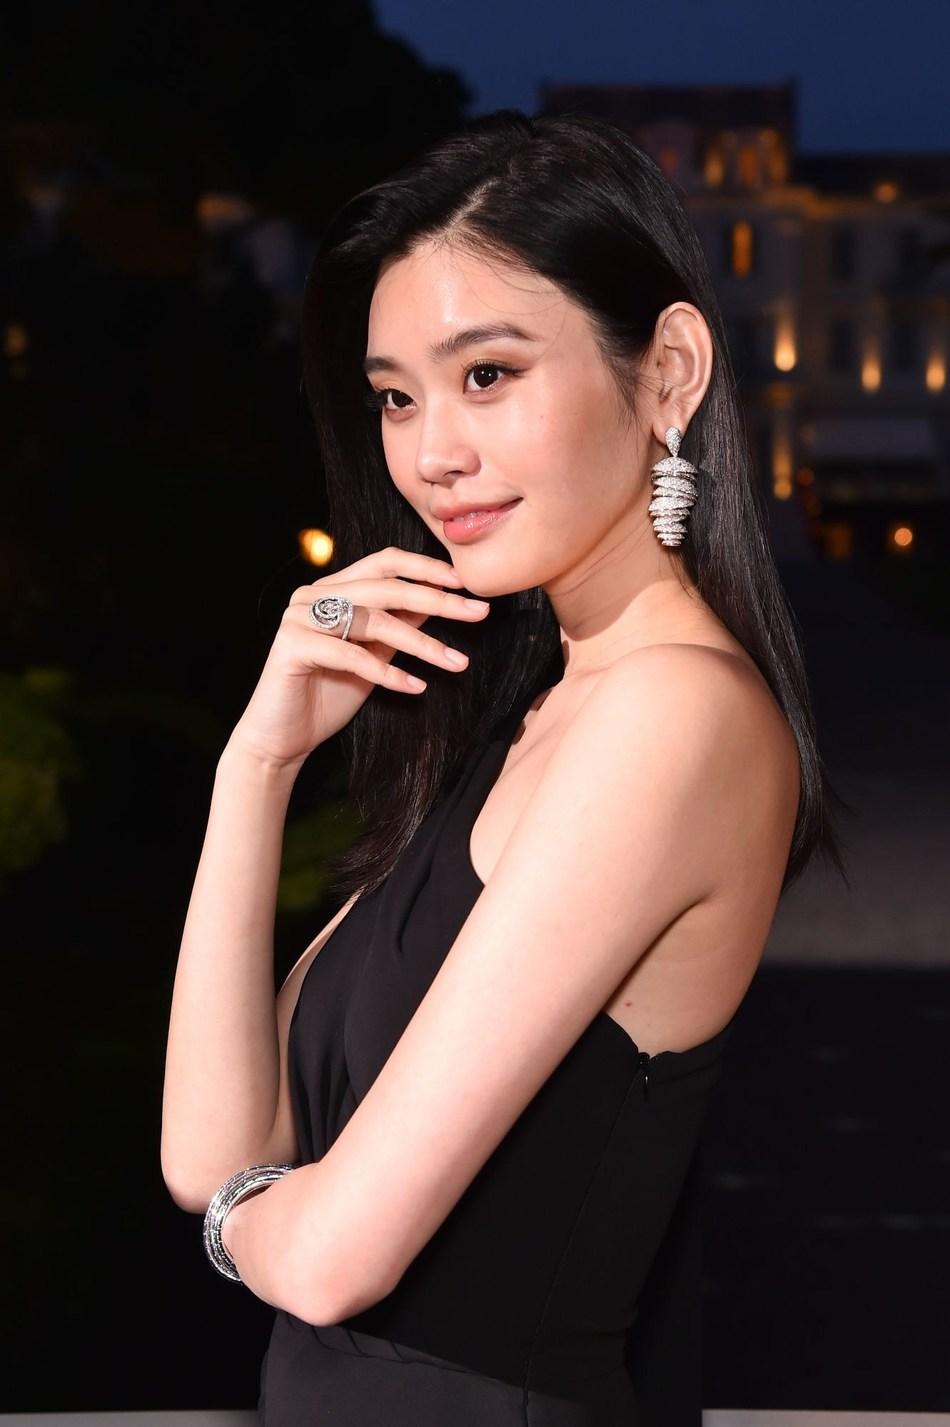 de GRISOGONO Cannes 2017 Ming Xi (PRNewsfoto/de GRISOGONO)